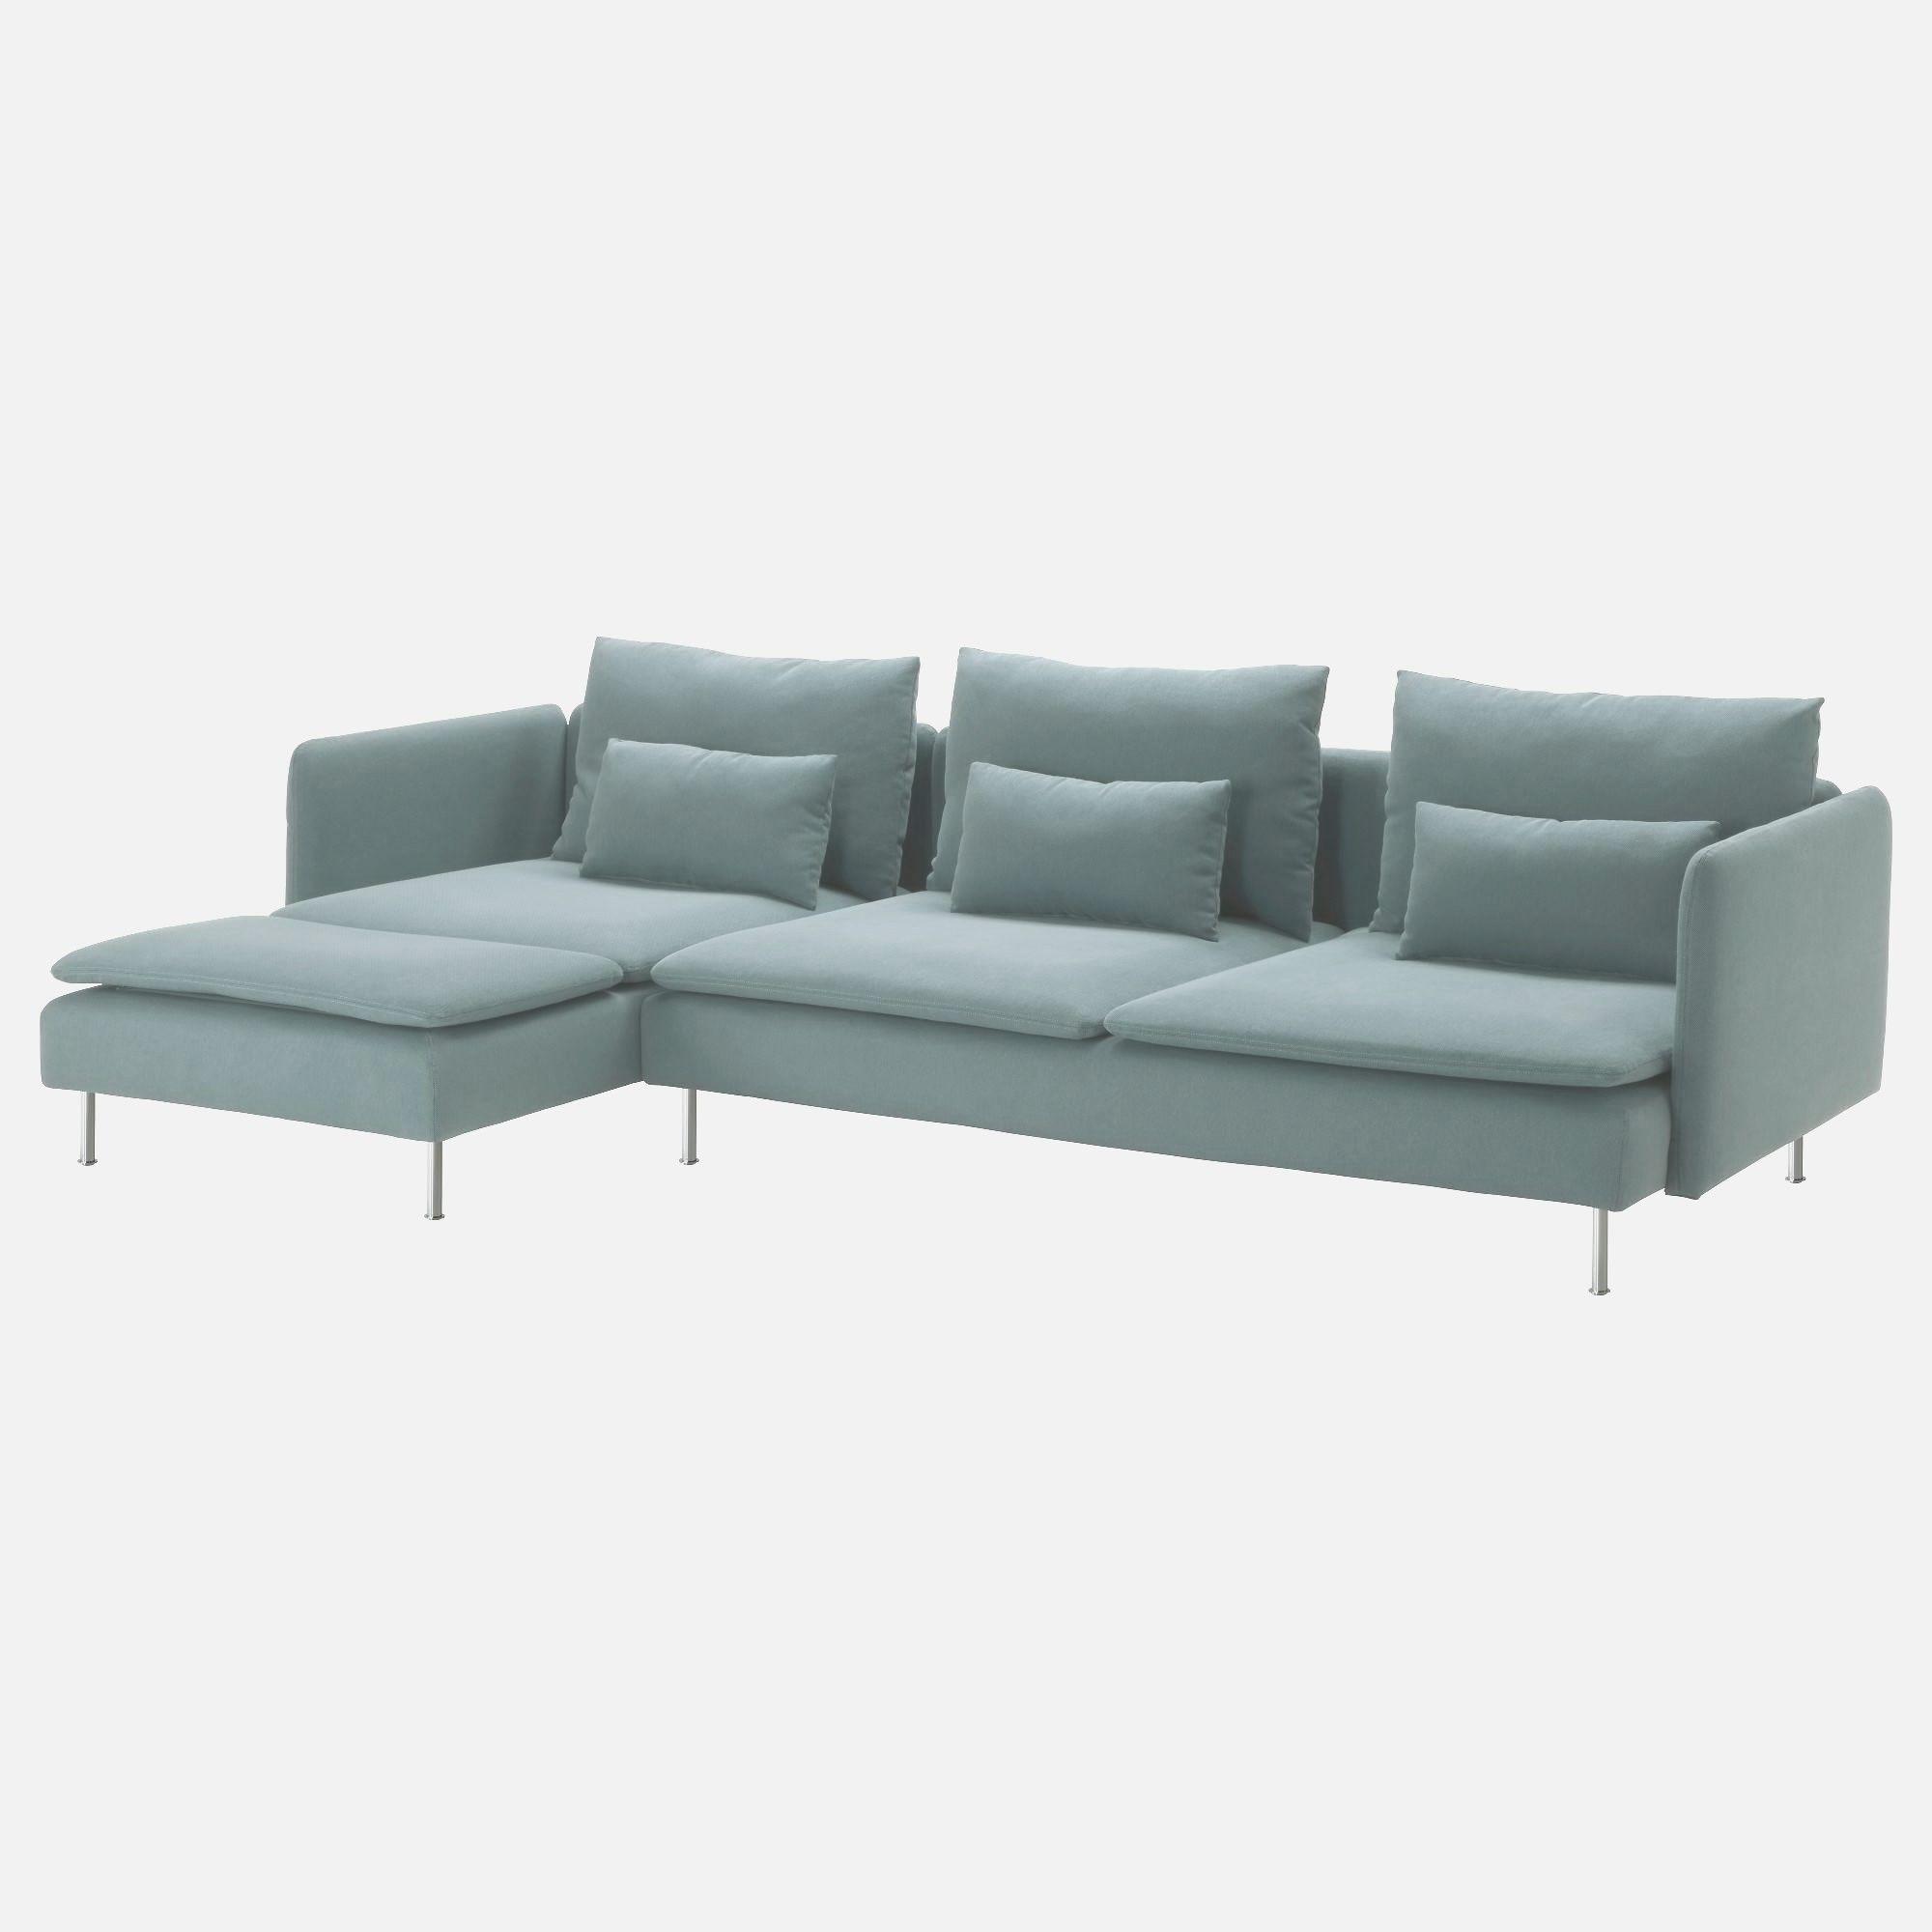 Slipcovers for Sectional sofas custom slipcovers for sectional